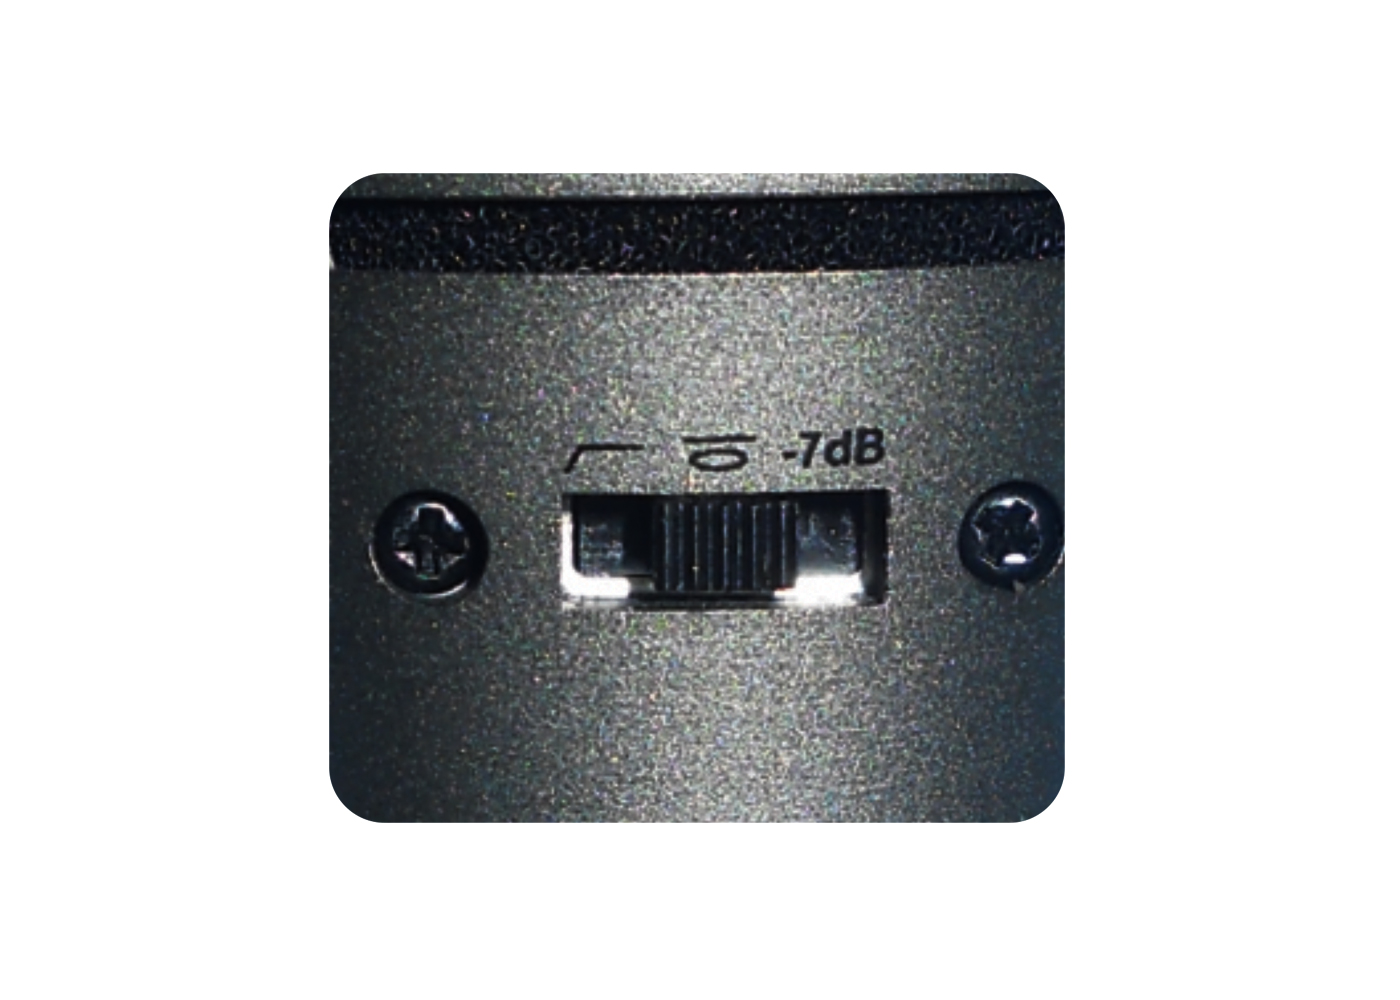 f301d switch 6